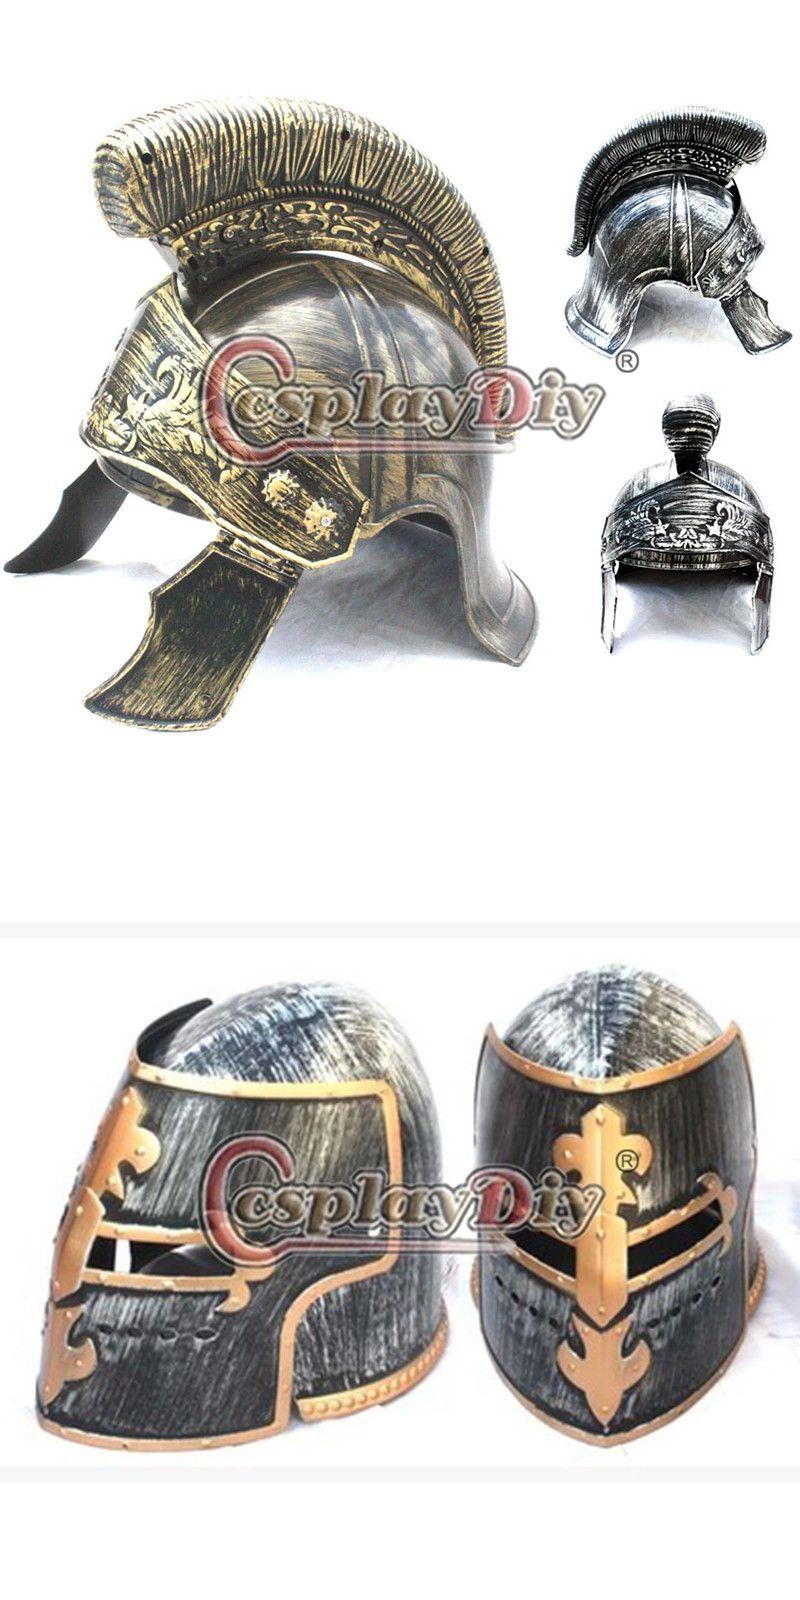 Cosplaydiy New Arrival Knight Helmet Costume Ancient Rome Hallloween Costume Cap Free Shipping D0603  sc 1 st  Pinterest & Cosplaydiy New Arrival Knight Helmet Costume Ancient Rome Hallloween ...